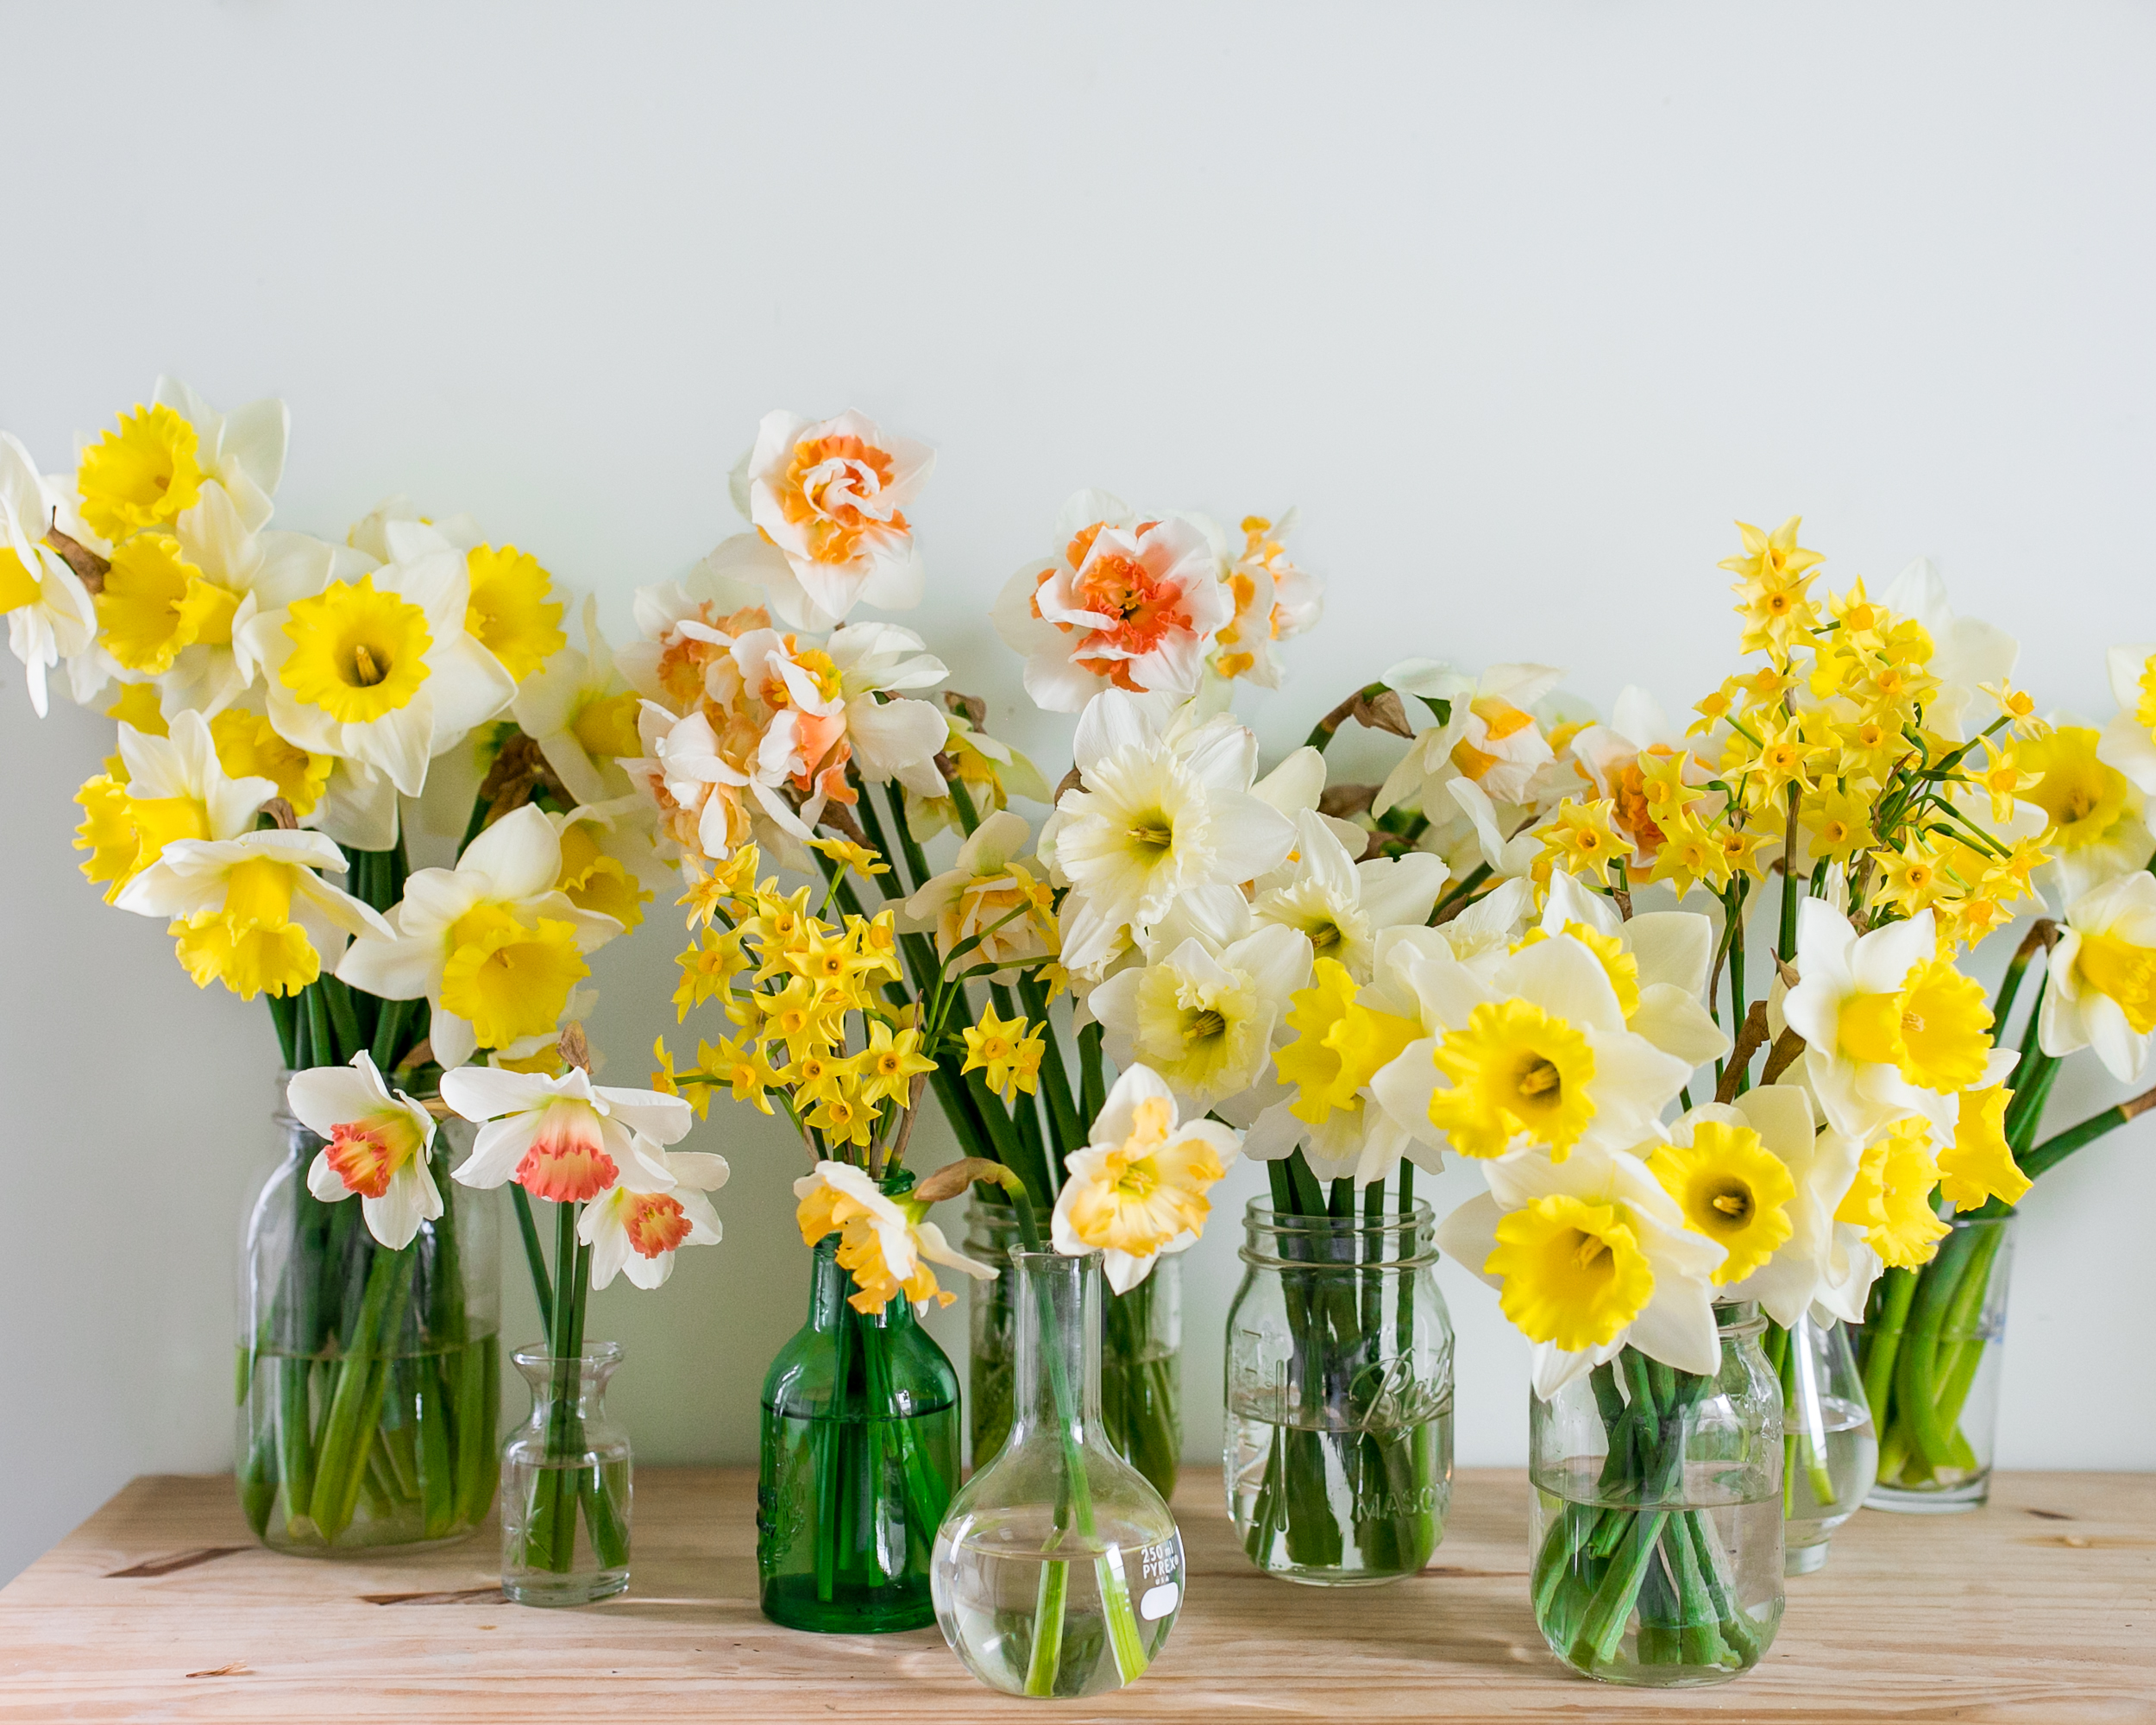 daffodil19-1.jpg